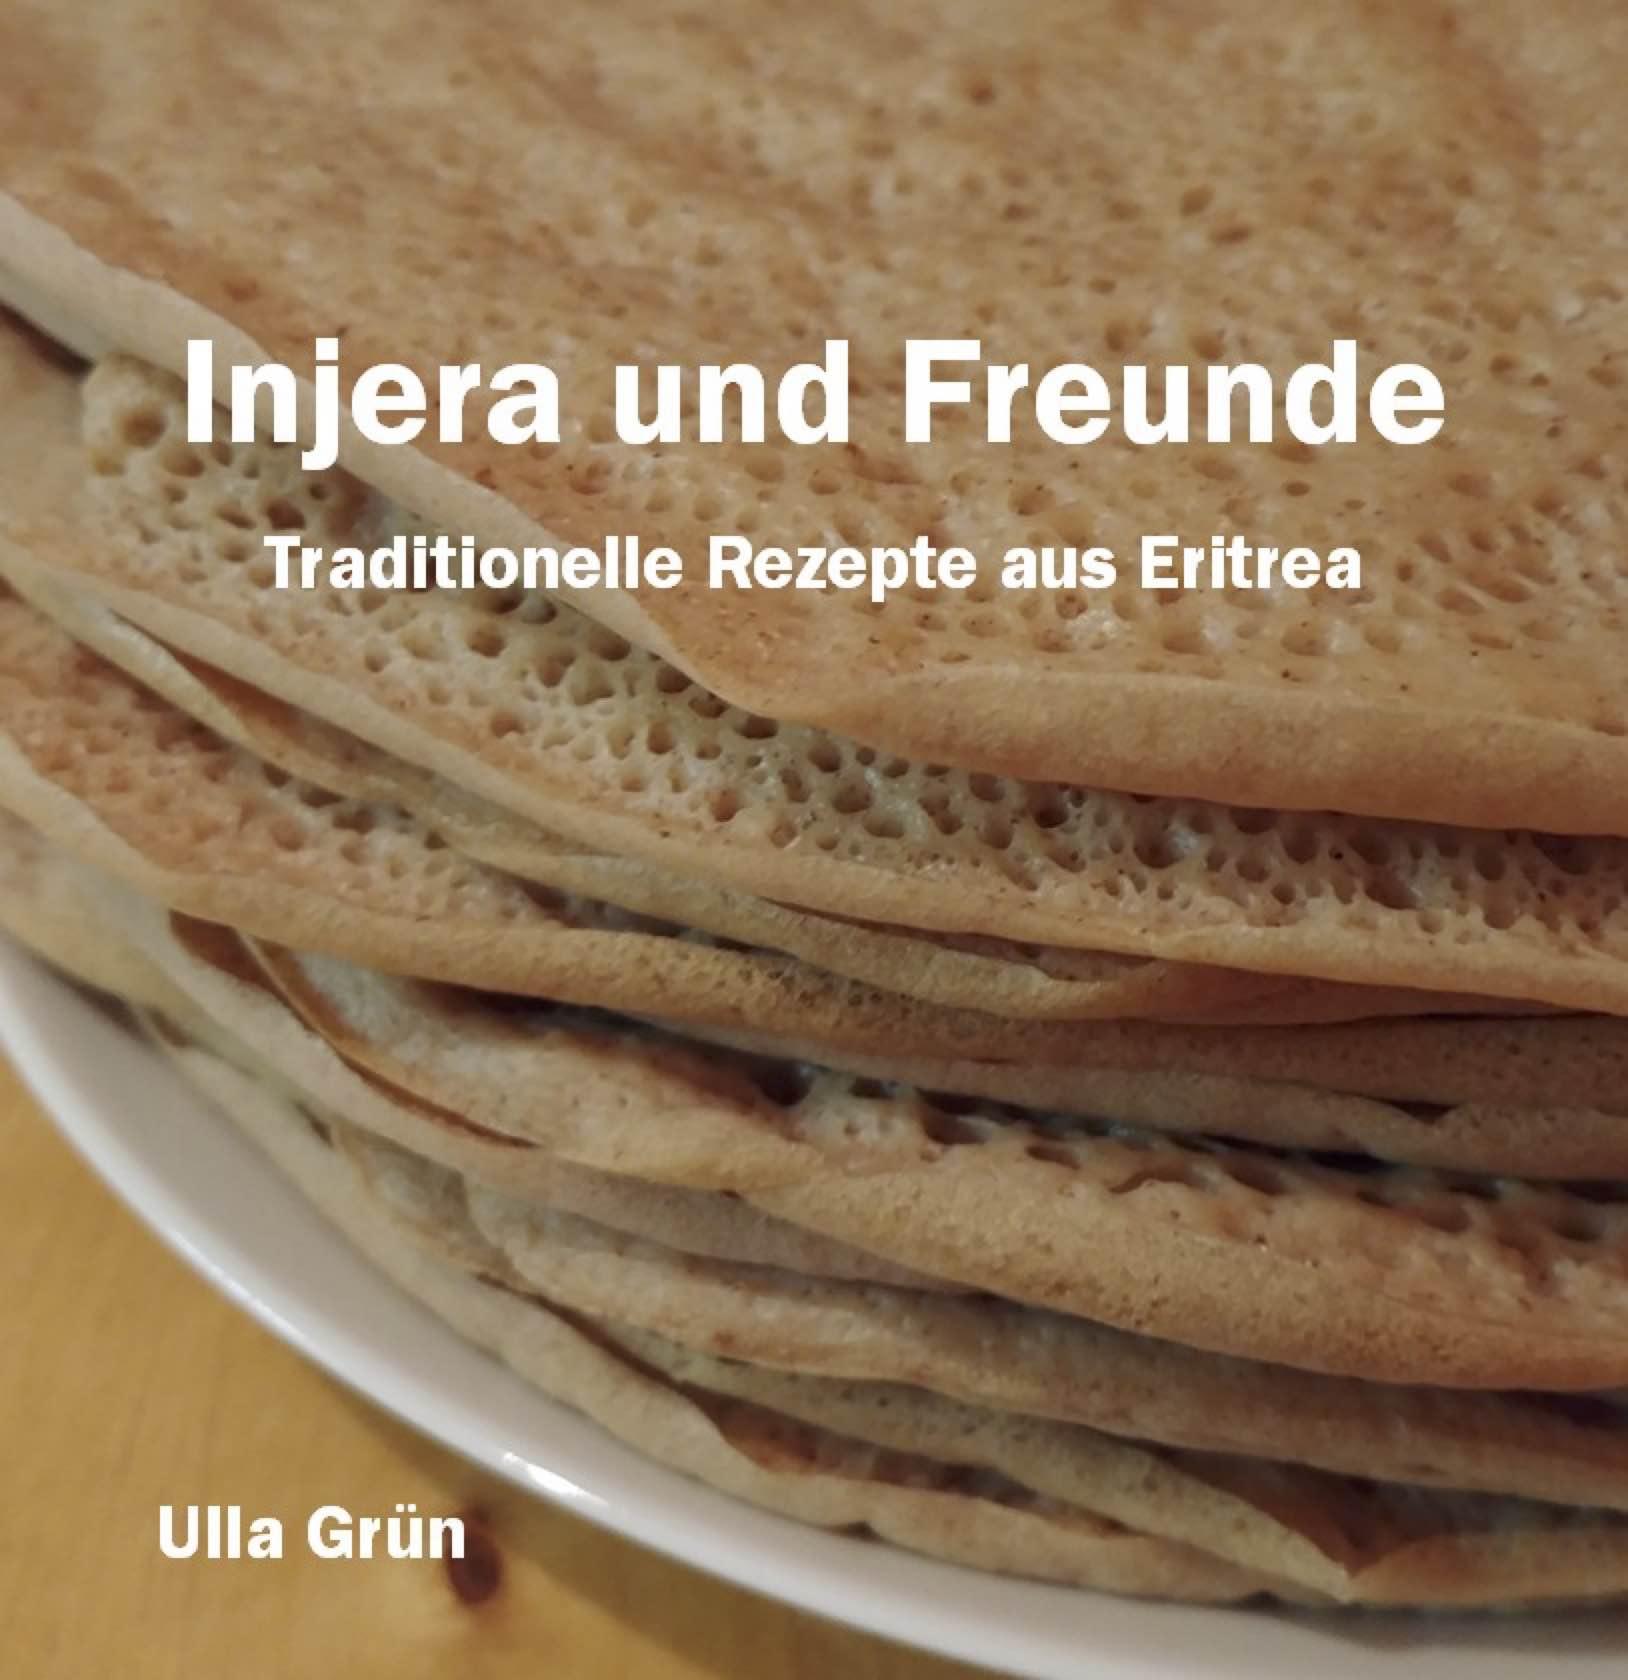 Injera Und Freunde Cover Web